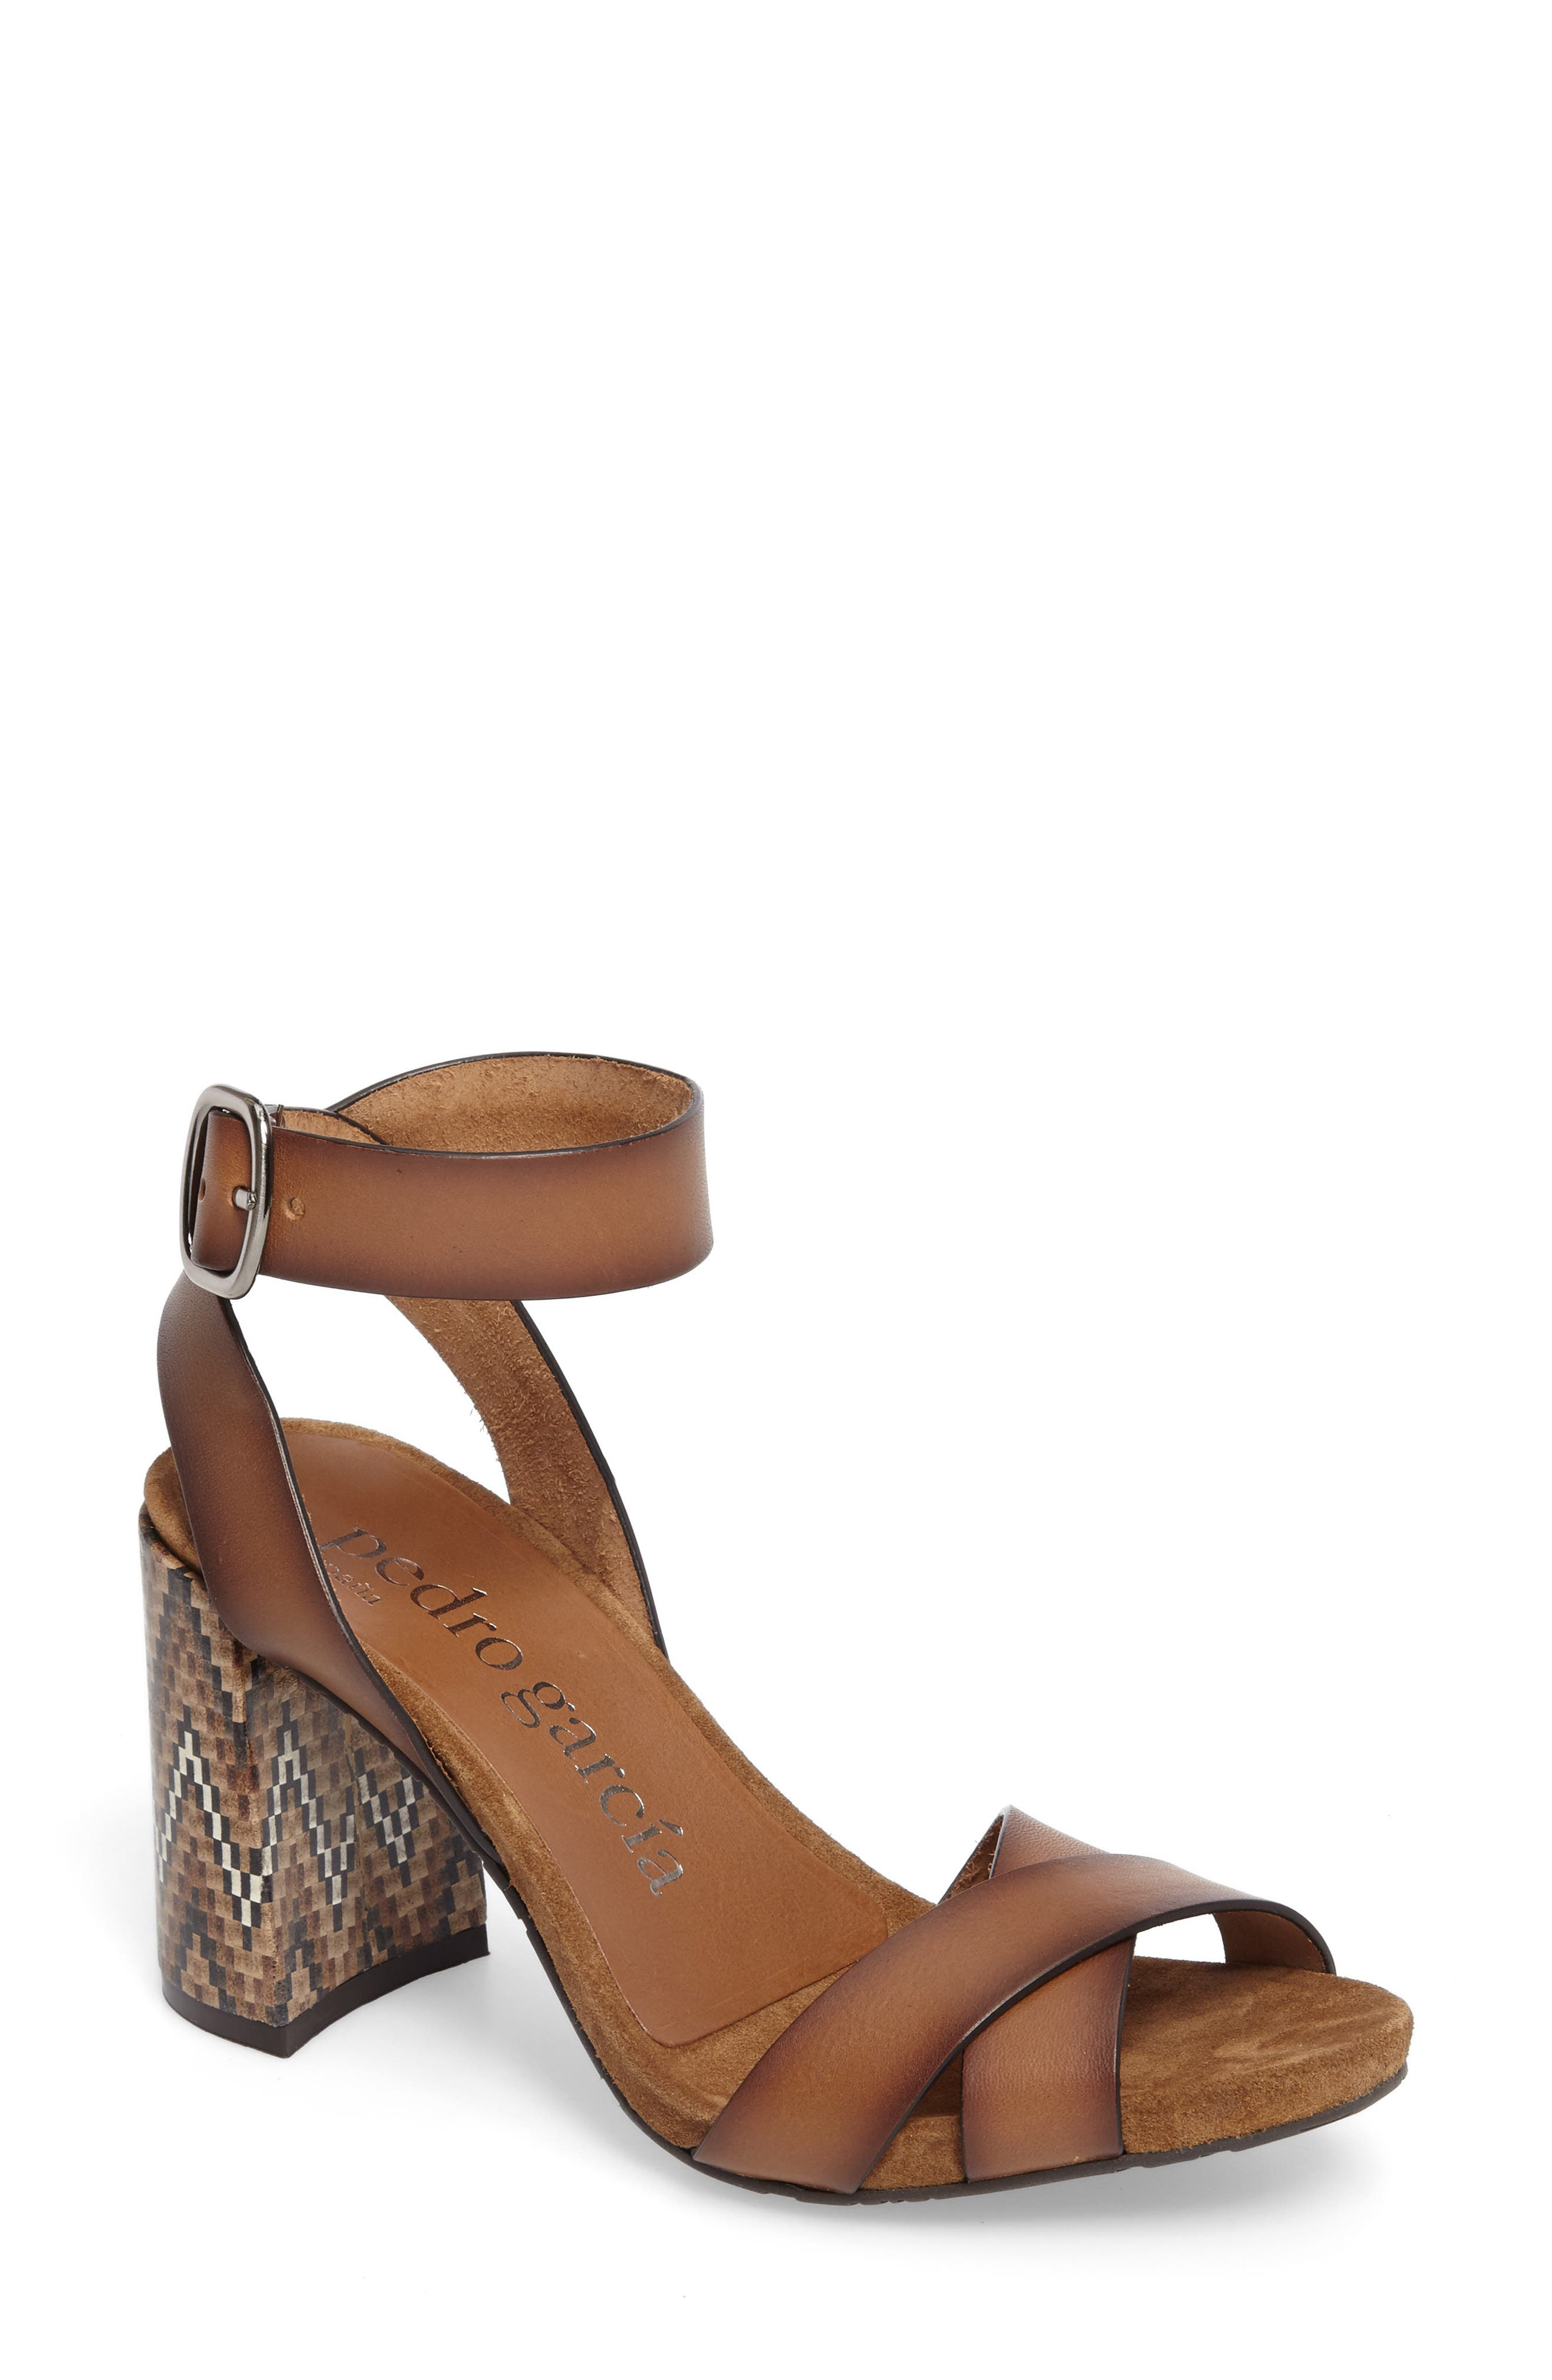 Yemba Embellished Heel Sandal,                         Main,                         color, Cigar Vacchetta